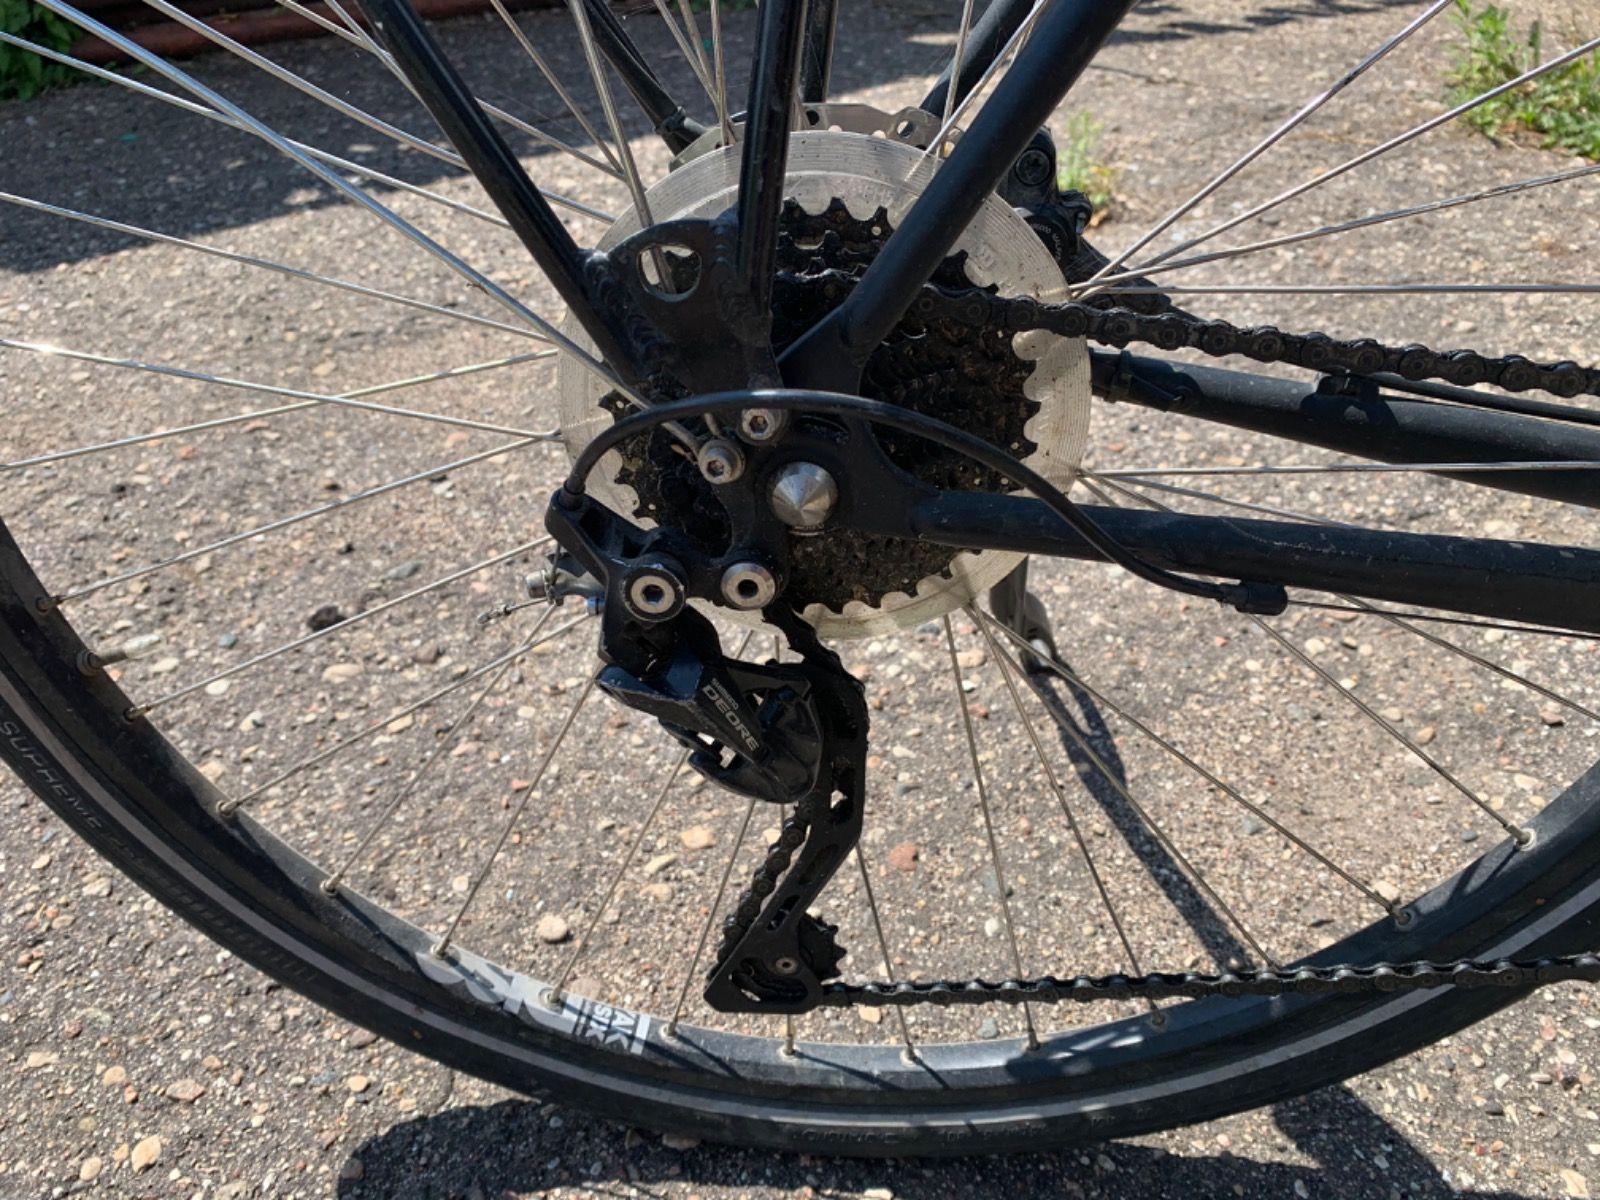 хромолевый туринг Vsf Fahrradmanufaktur T500